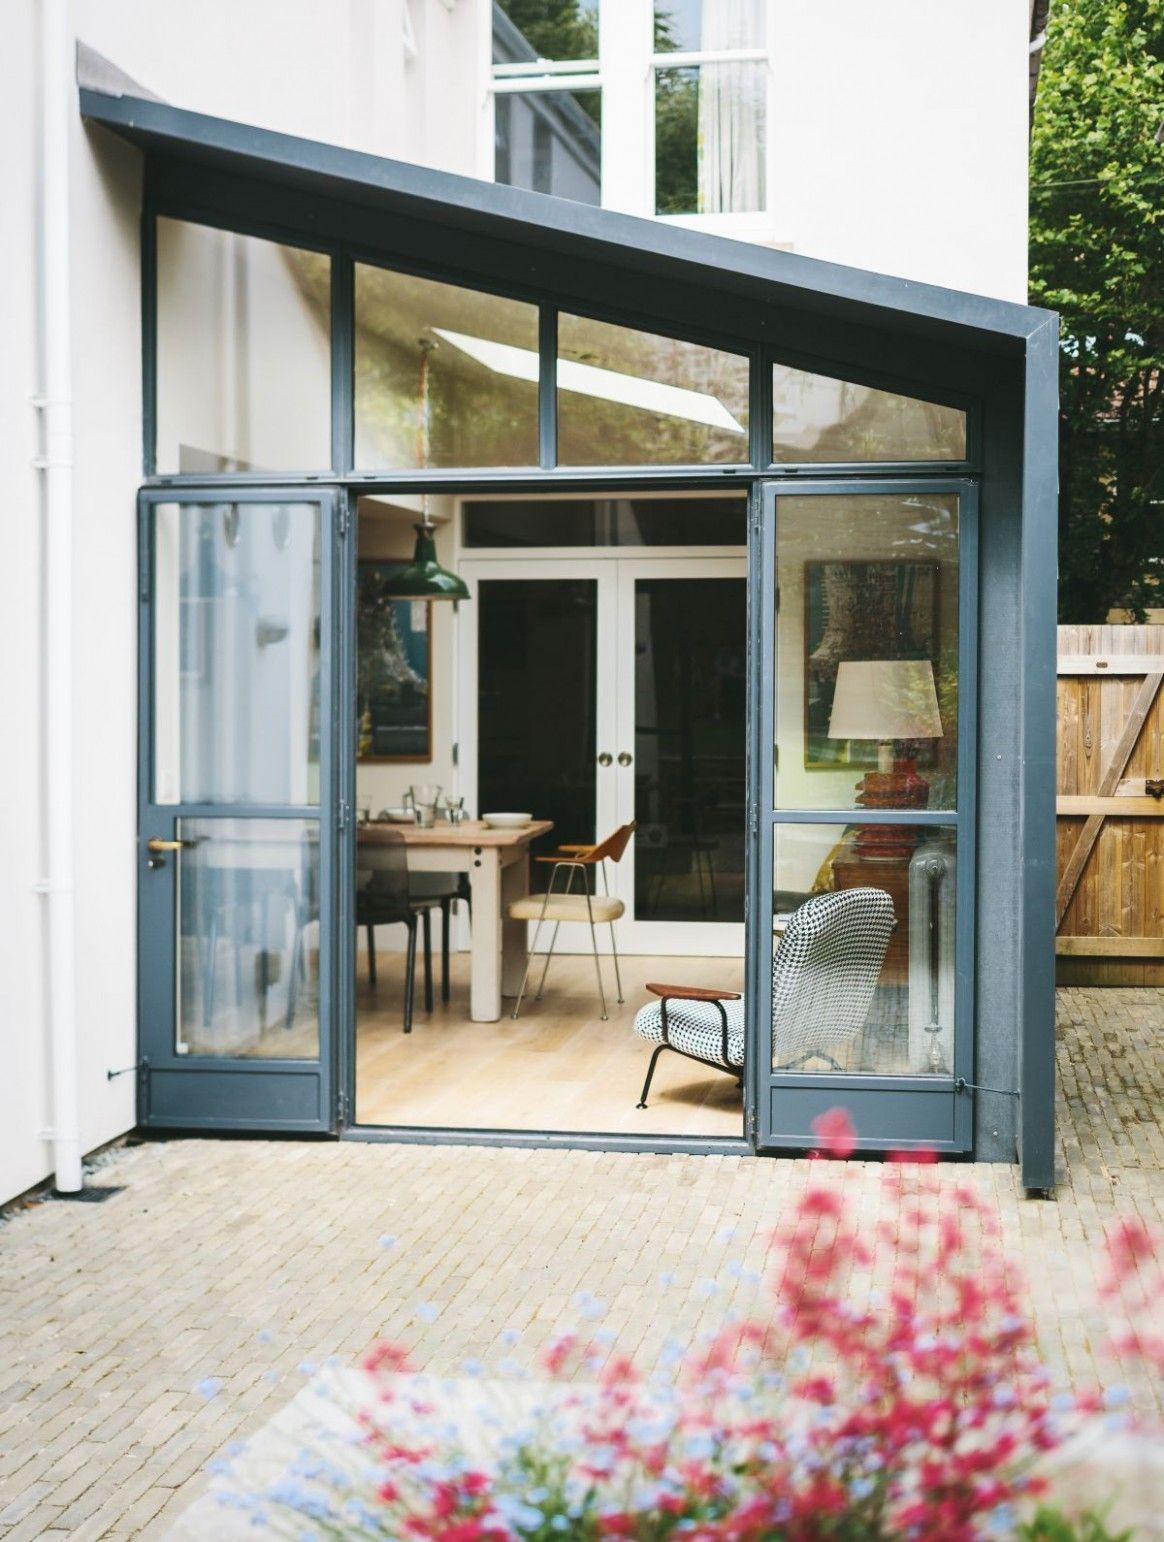 Small Bedroom Extension Ideas  House extension design, Garden